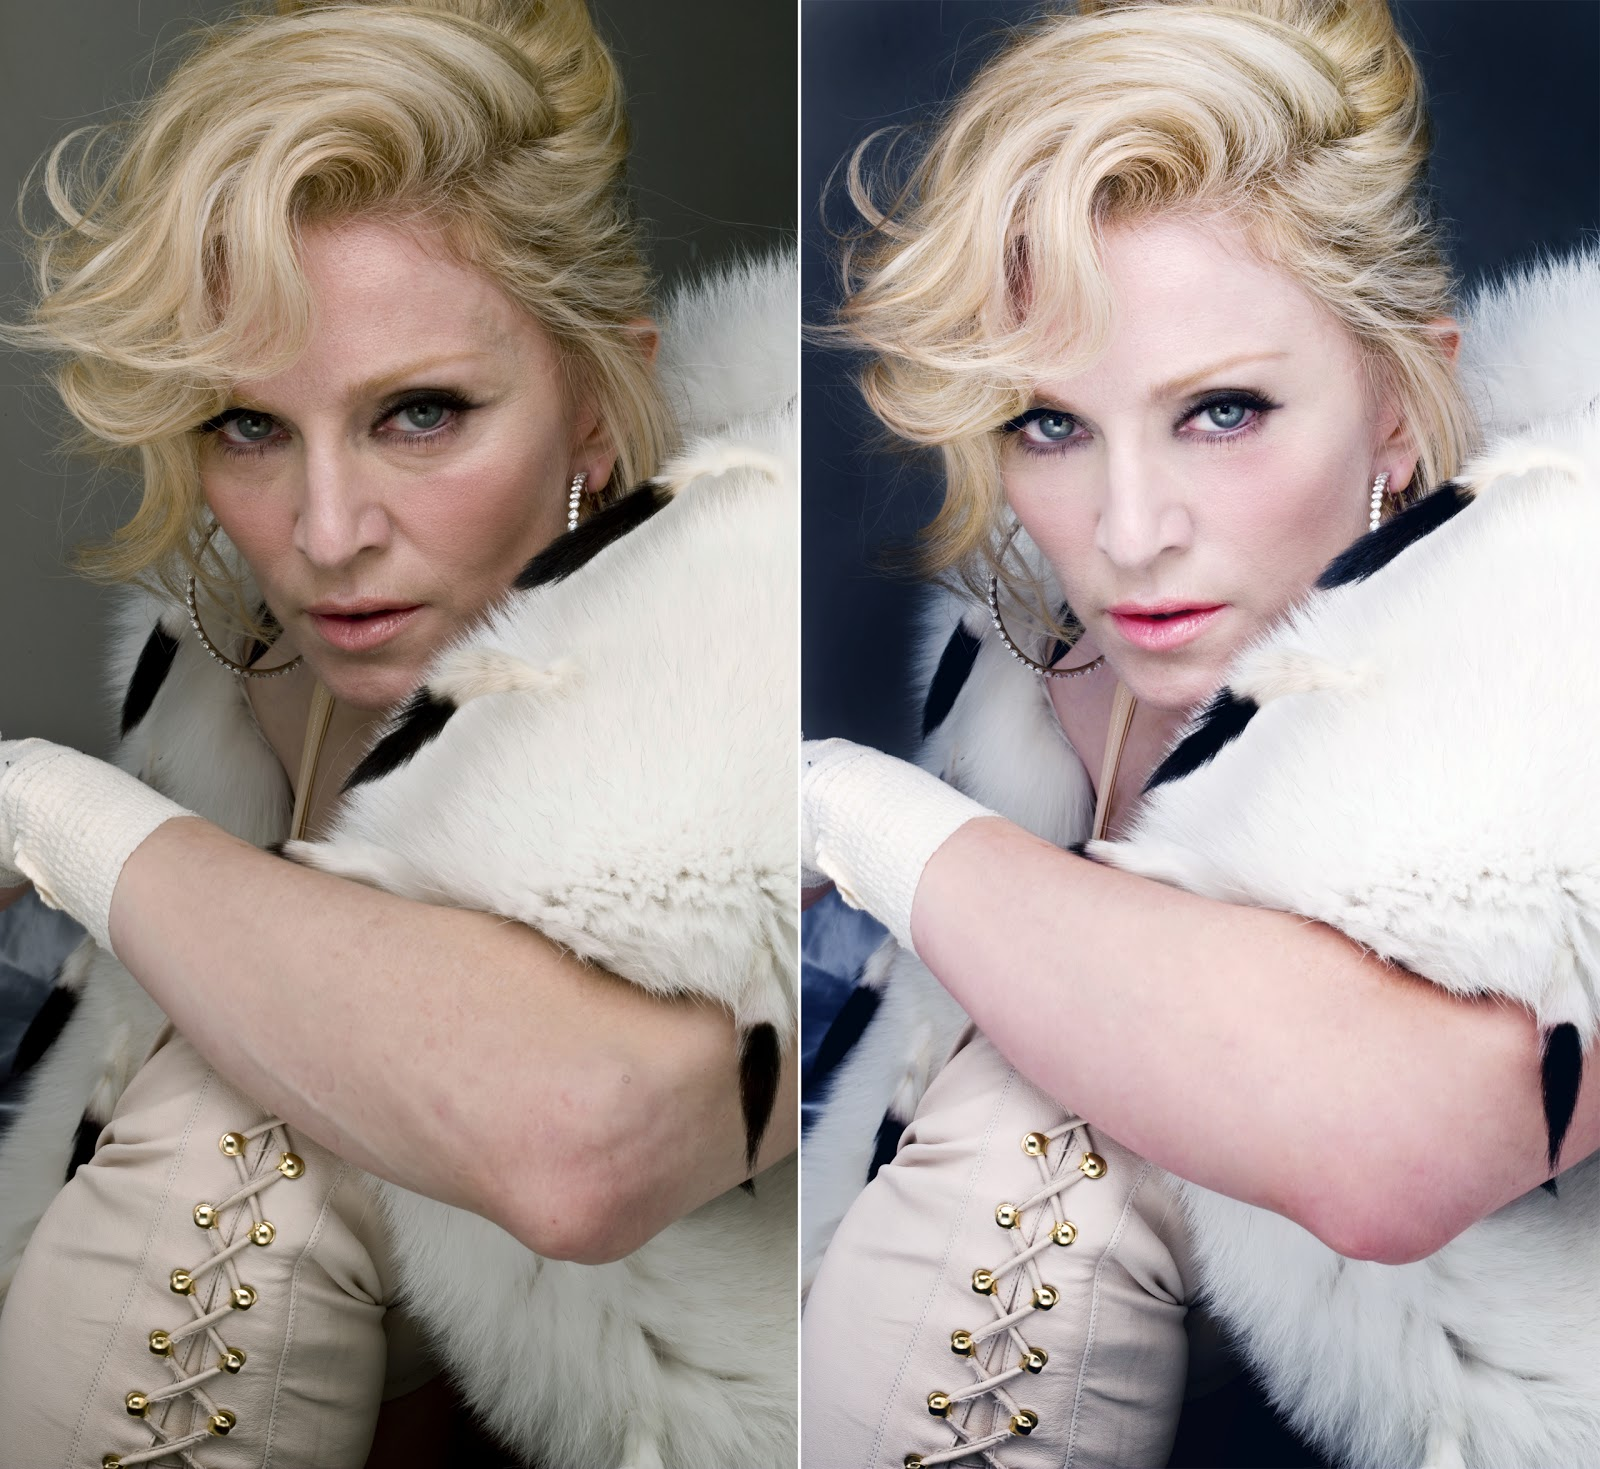 http://3.bp.blogspot.com/_sWRNg-HRmEM/TSDdjpSb1aI/AAAAAAAAAdw/S4spU7kznyc/s1600/2008+-+Madonna+by+Steven+Klein+Outtake+-+00104+c%25C3%25B3pia.jpg